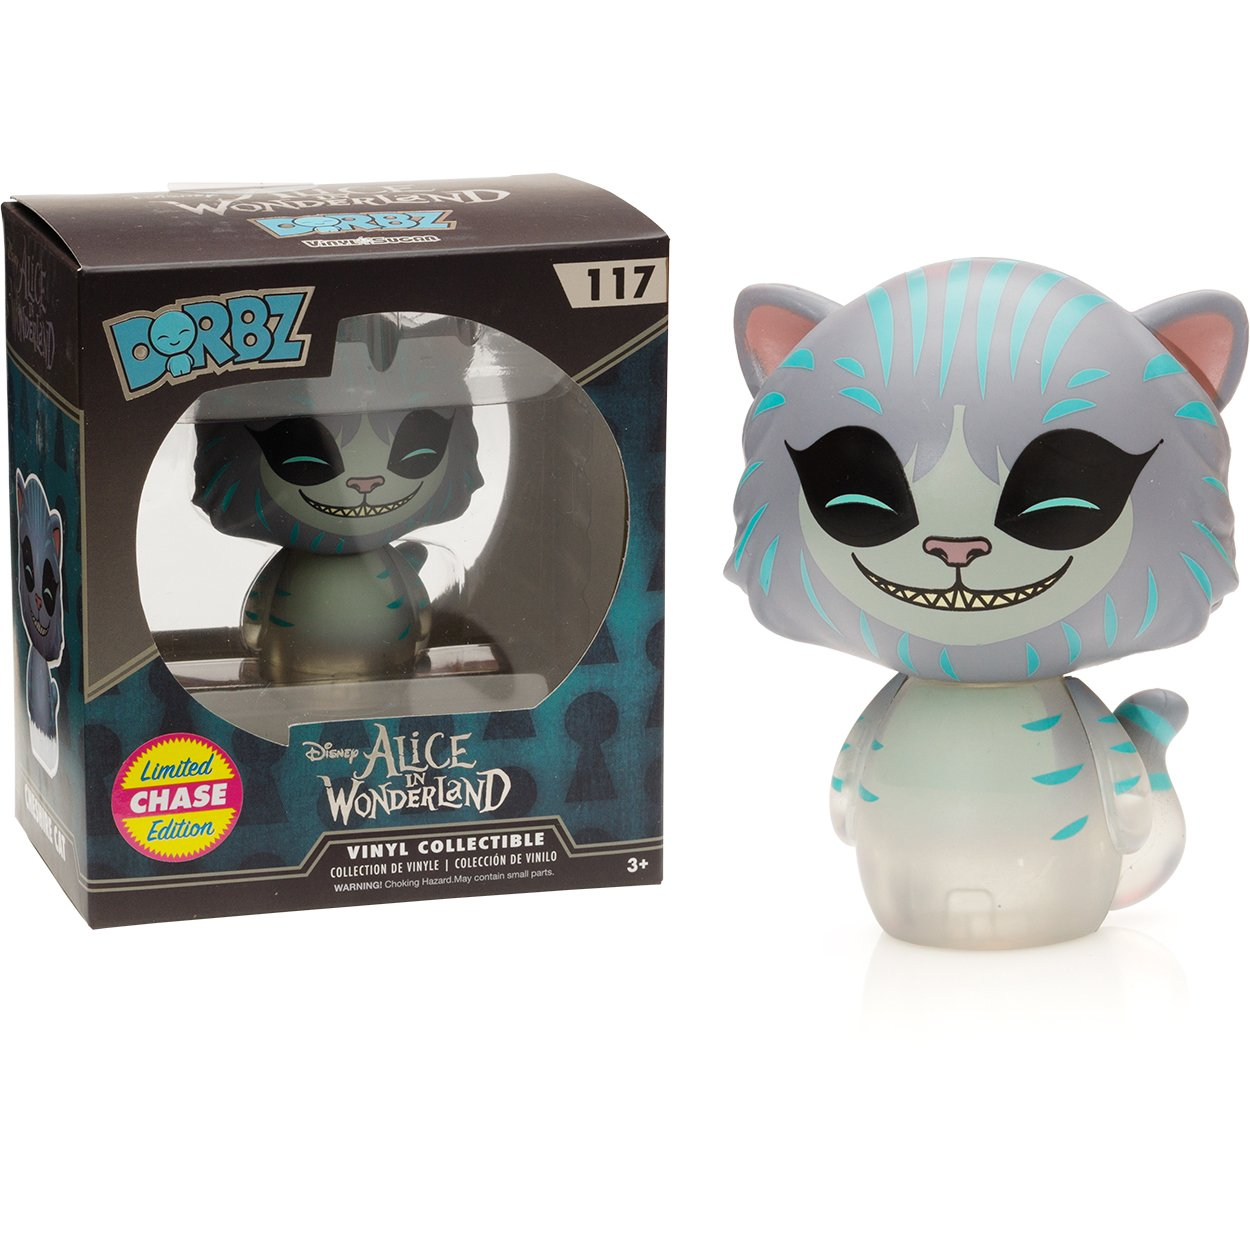 Cheshire Cat : Funko Dorbz x Disney Alice in Wonderland Mini Vinyl Figure 078164 BCC9488Q0 1 FREE Classic Disney Trading Card Bundle Chase